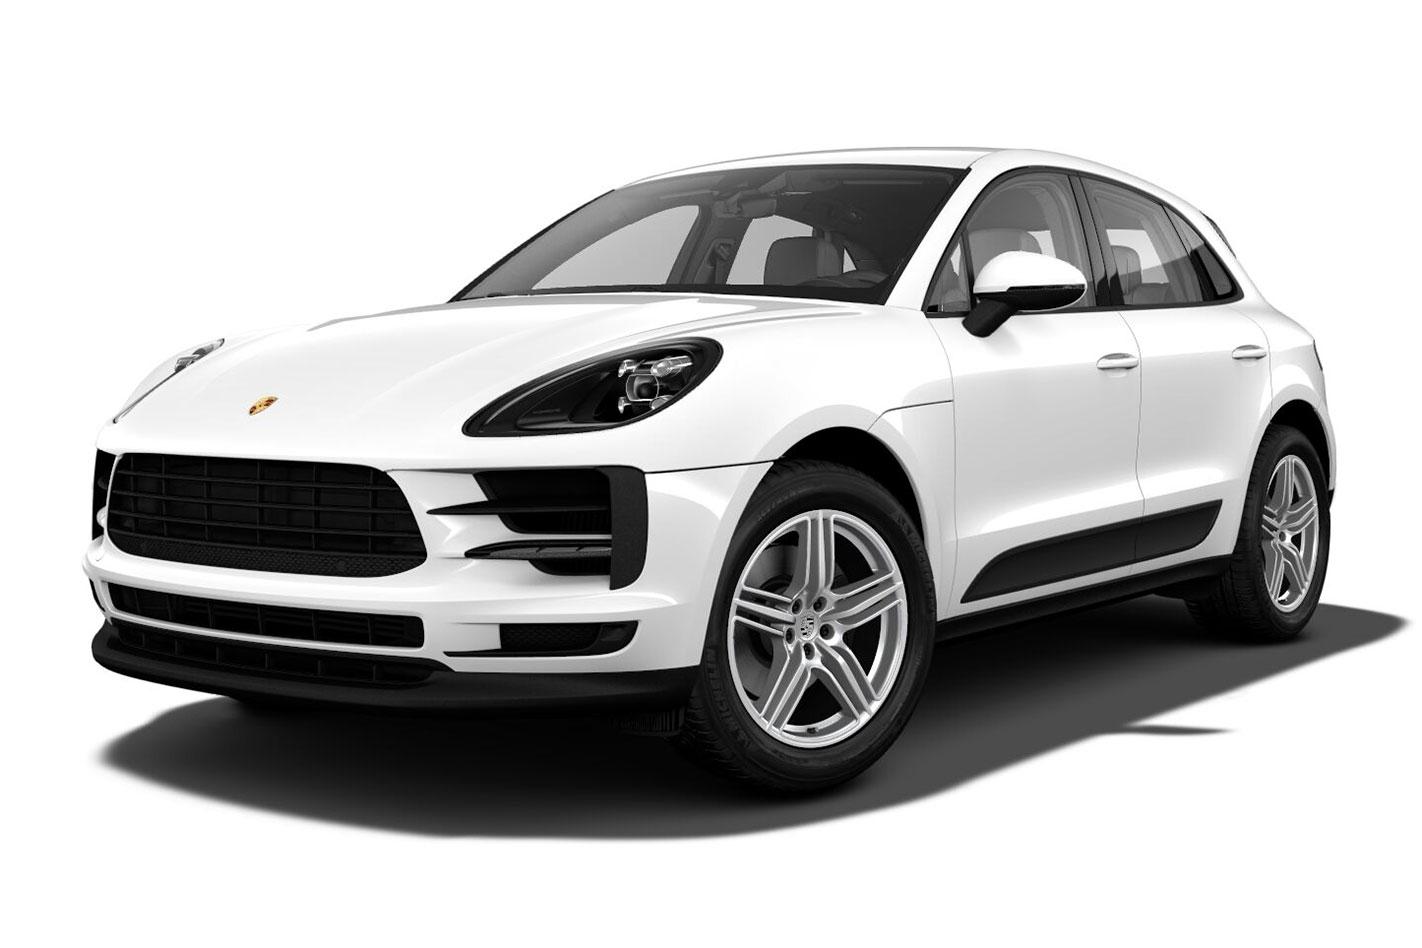 2021 Porsche Macan 2 0l 4cyl Petrol Turbocharged Automatic Suv